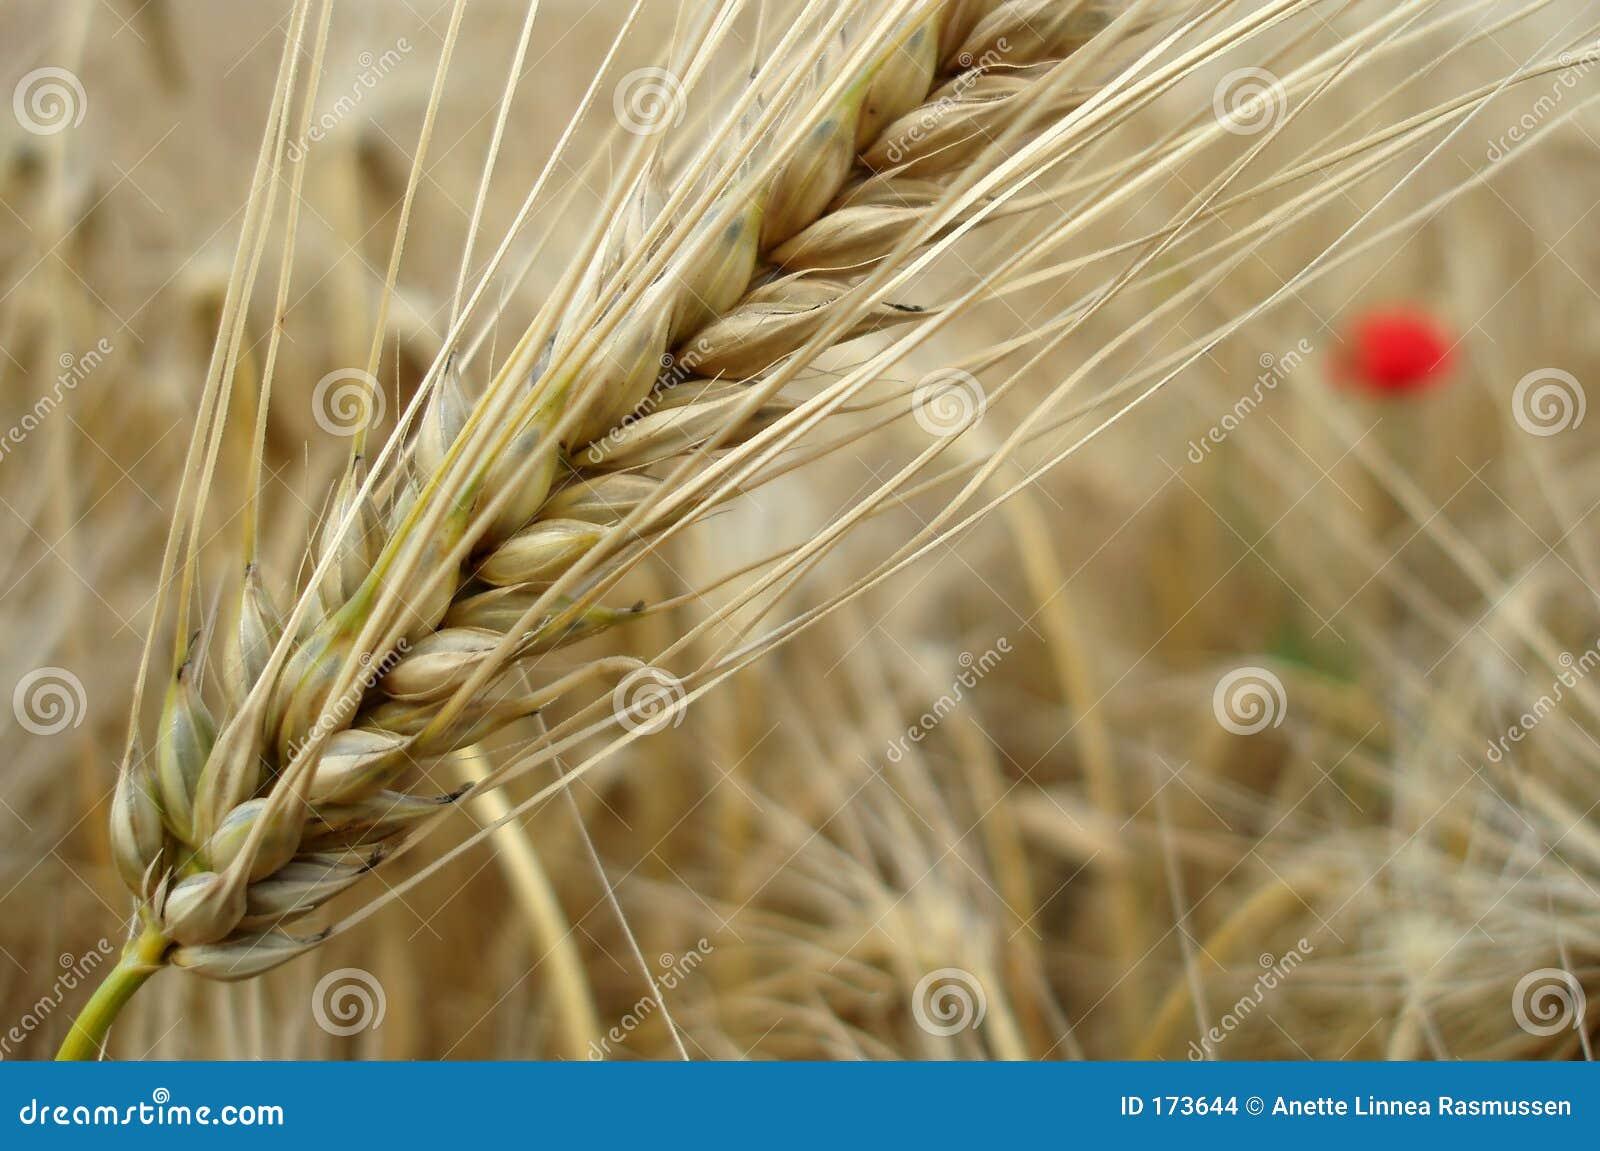 Corn with poppy